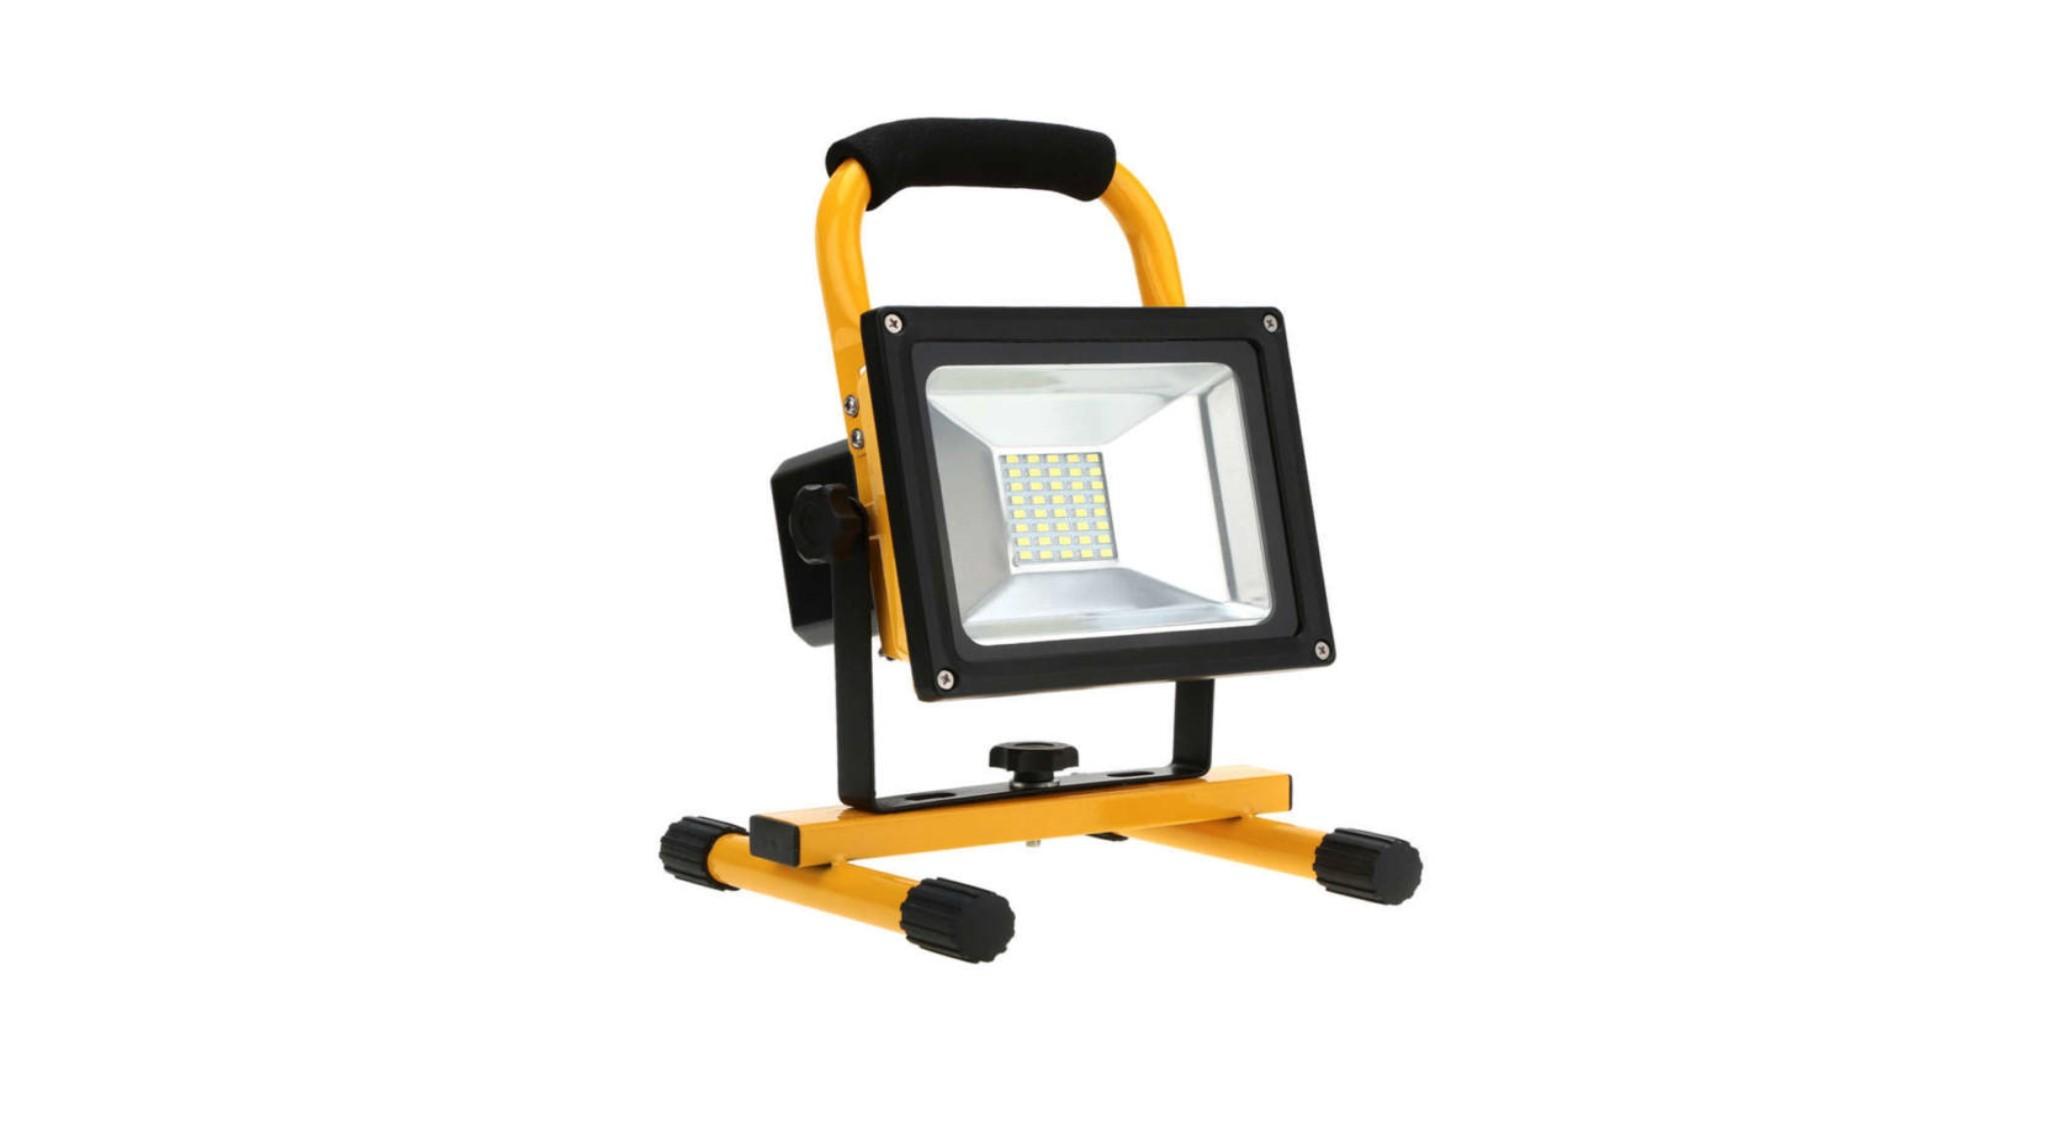 20 Watt Rechargeable LED Flood Light